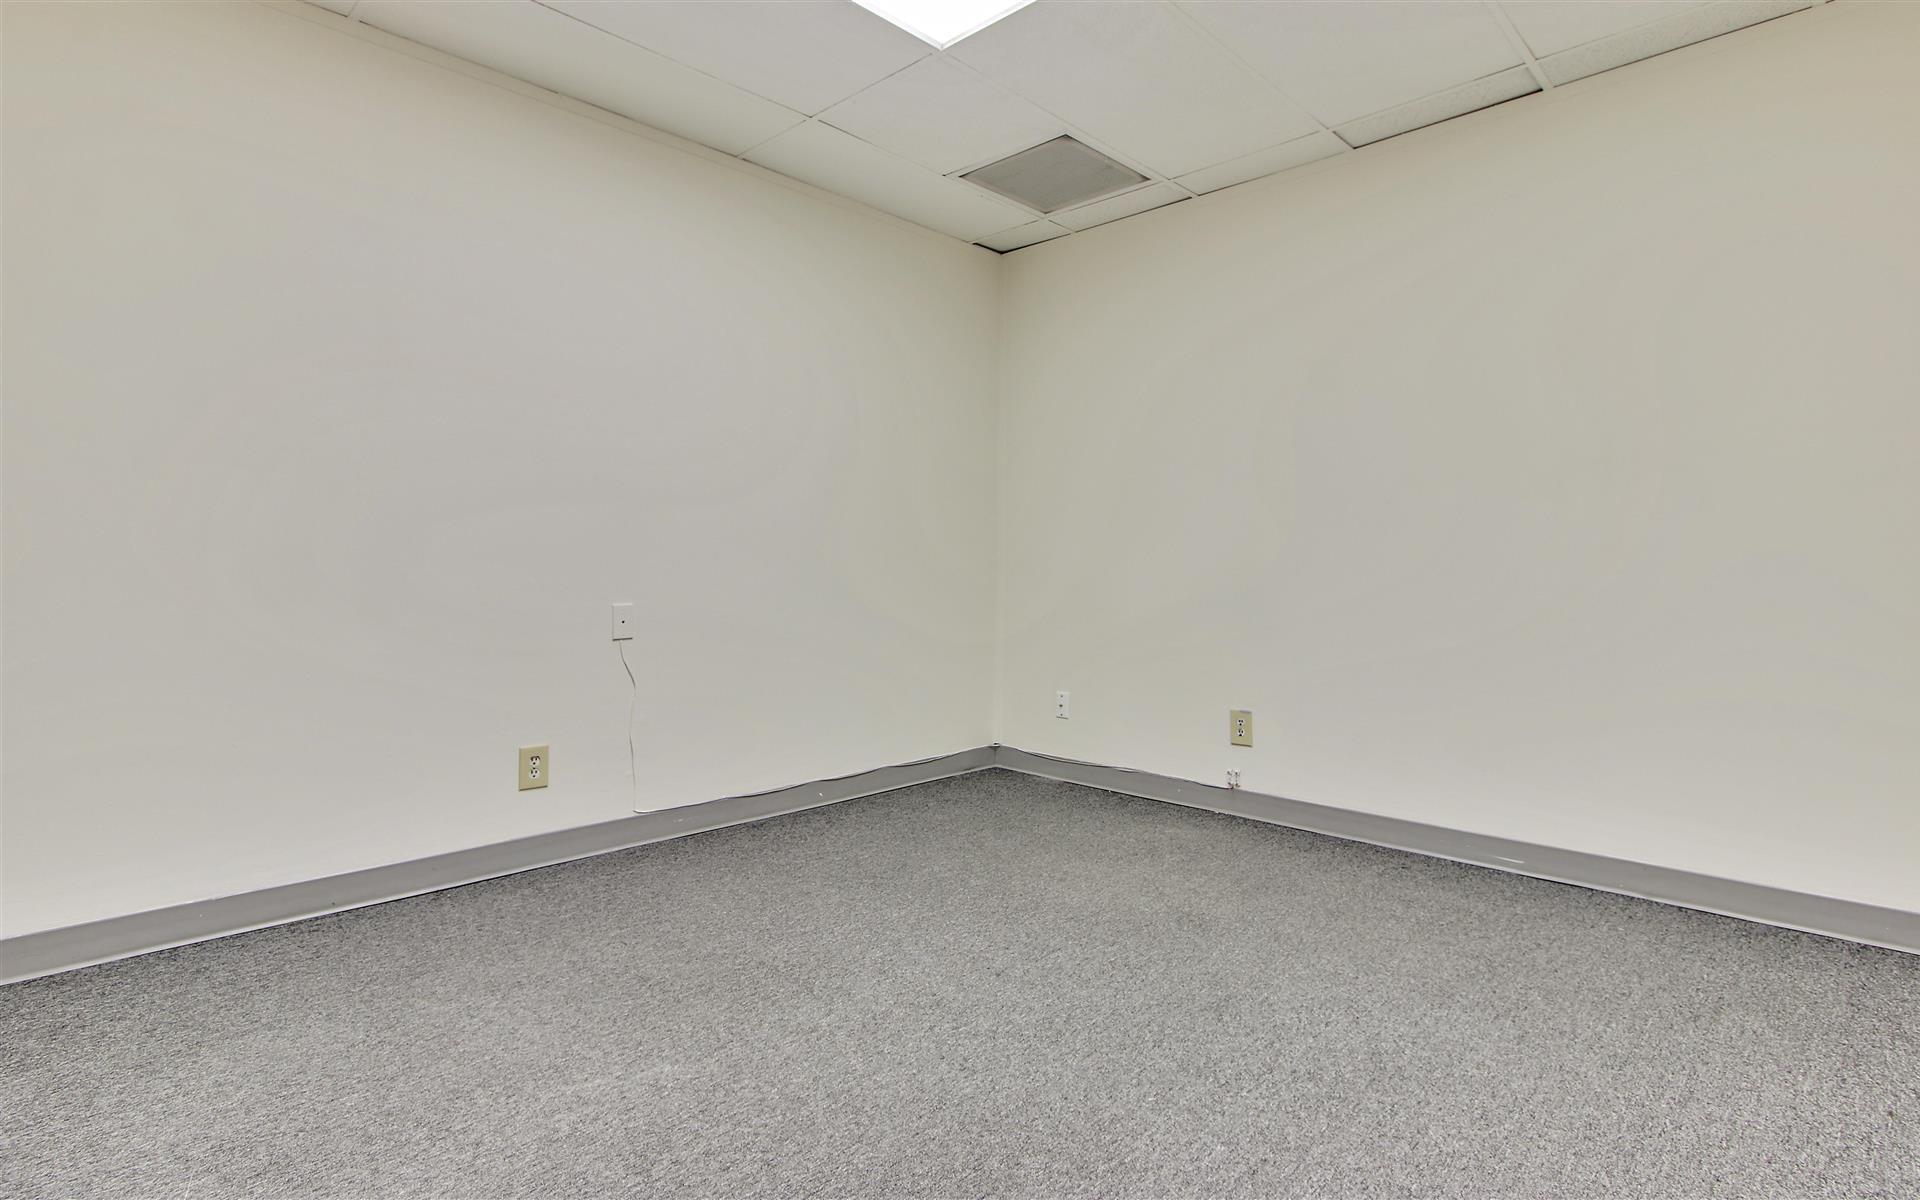 16200 Ventura Blvd. - Private Office Suite 317